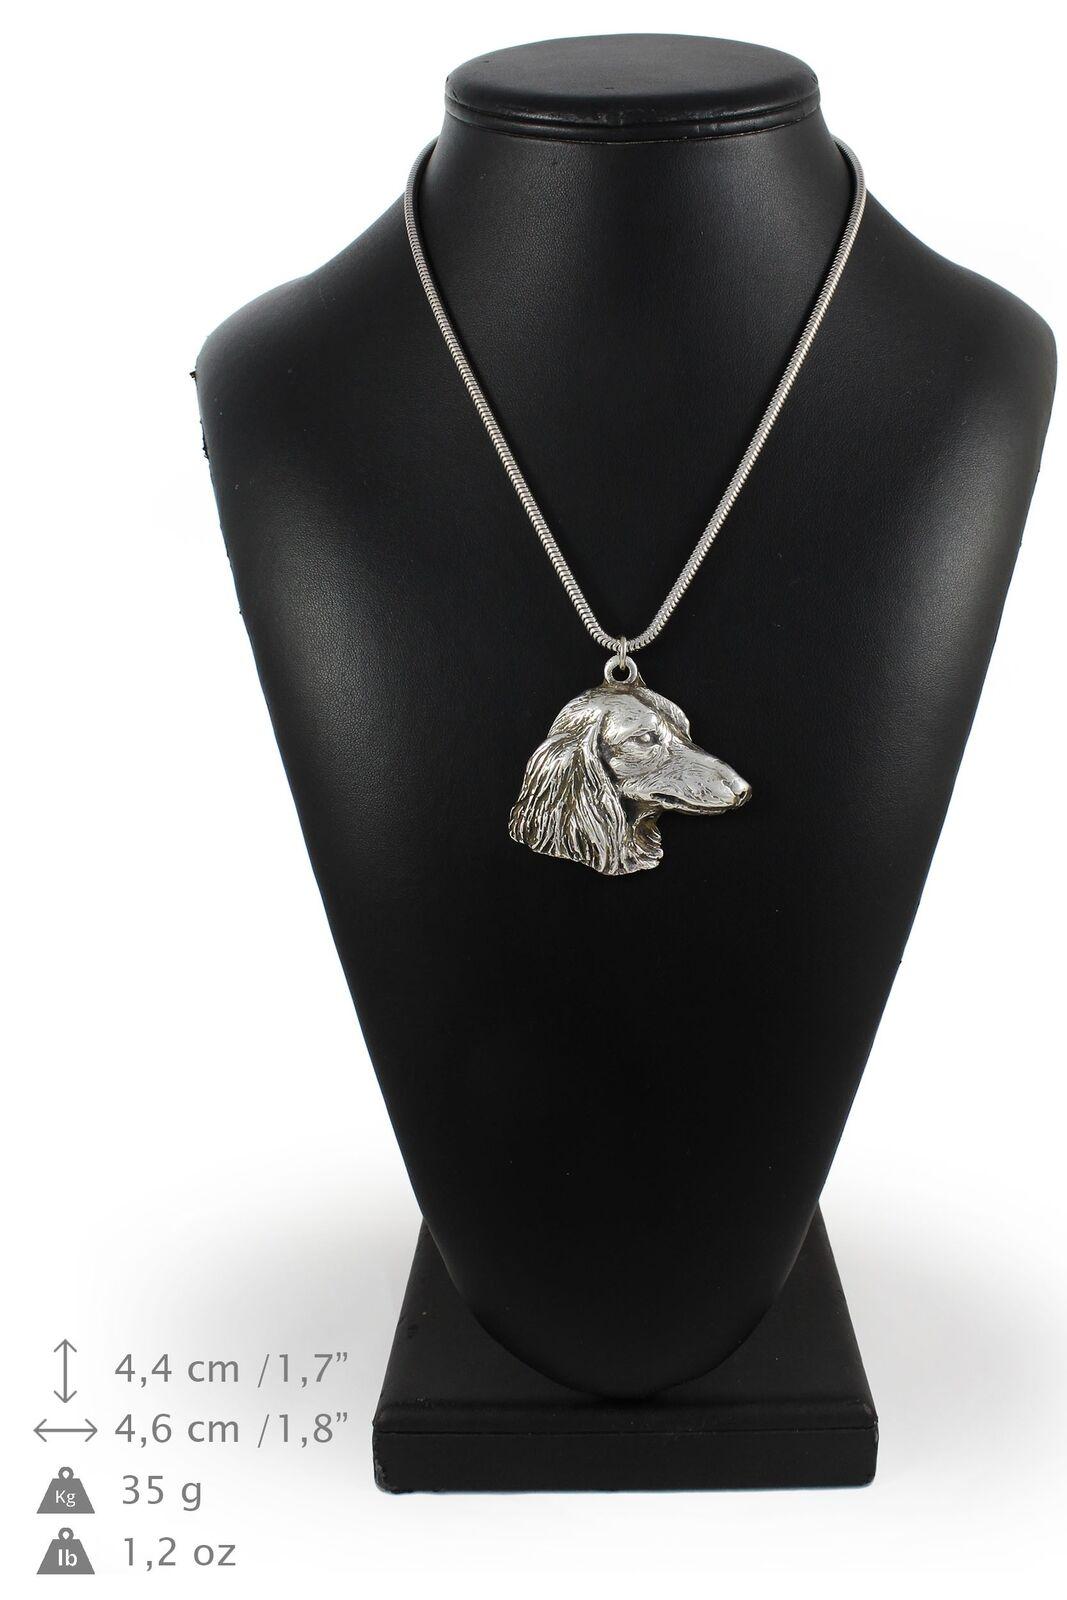 Tackel type 2 - collier en Silber plaqué sur une chaîne en Silber Art Dog FR